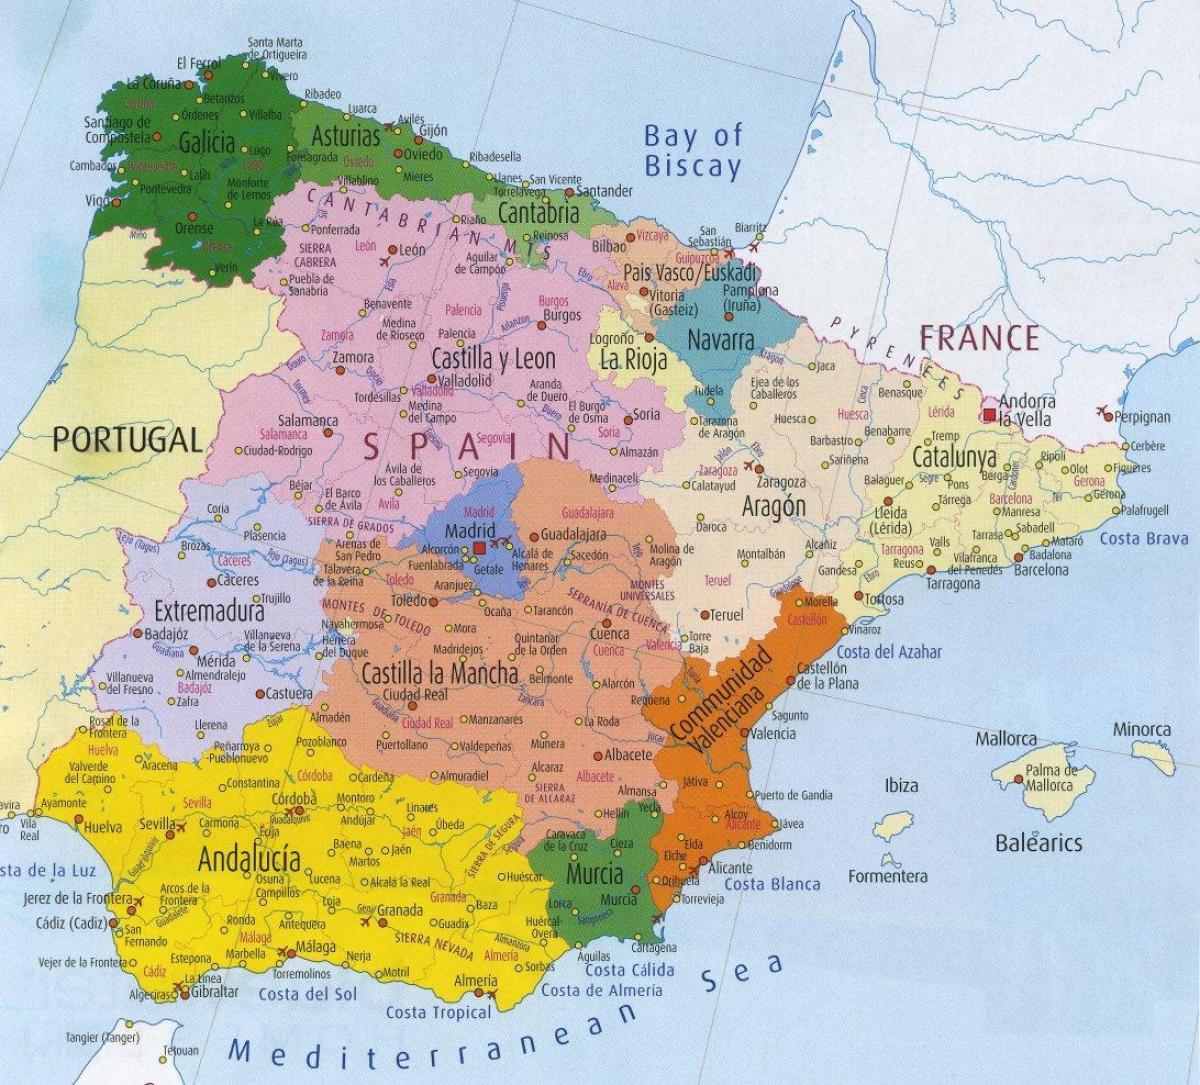 Terkep Spanyol Regiok Reszletes Terkep Spanyolorszag Regio Del